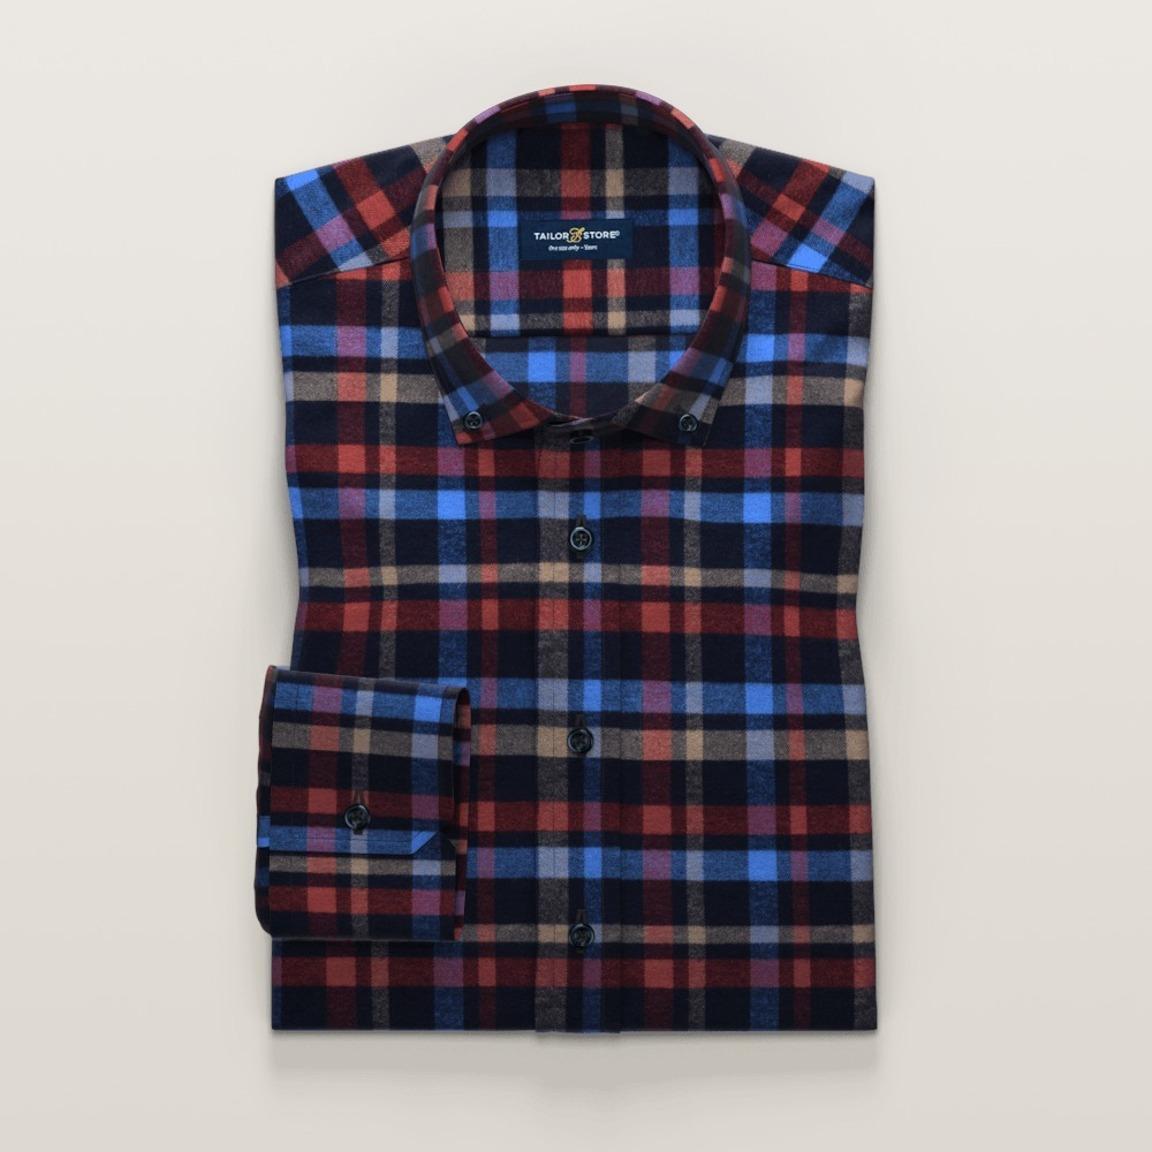 Rutig flanellskjorta i twill